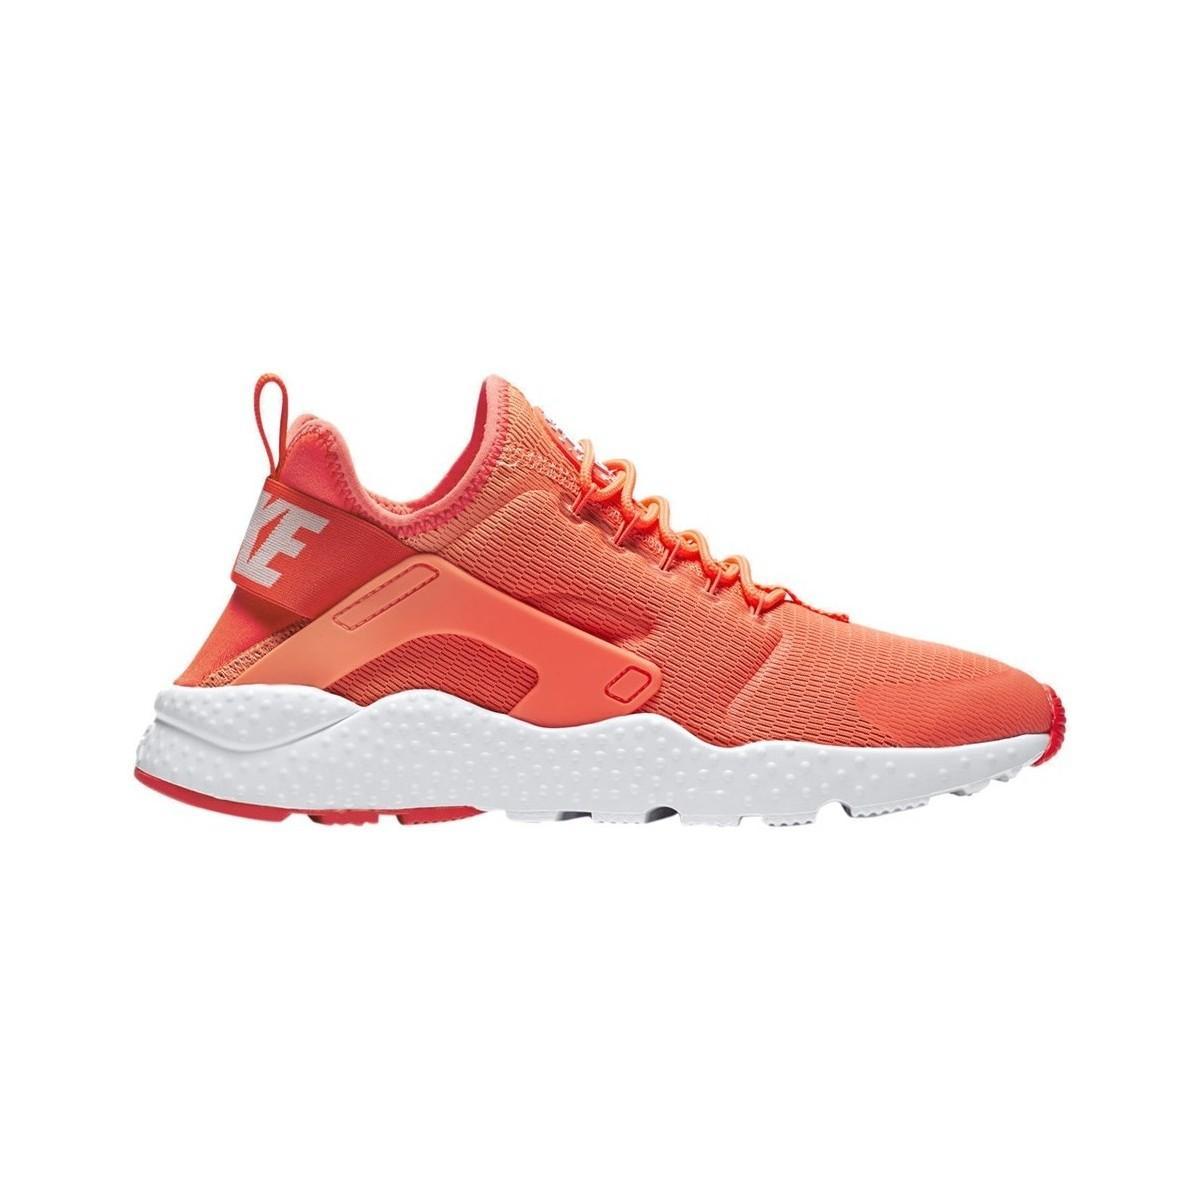 adbe3887183d1 Nike. Red W Air Huarache Run Ultra Women s Shoes (trainers) In Multicolour